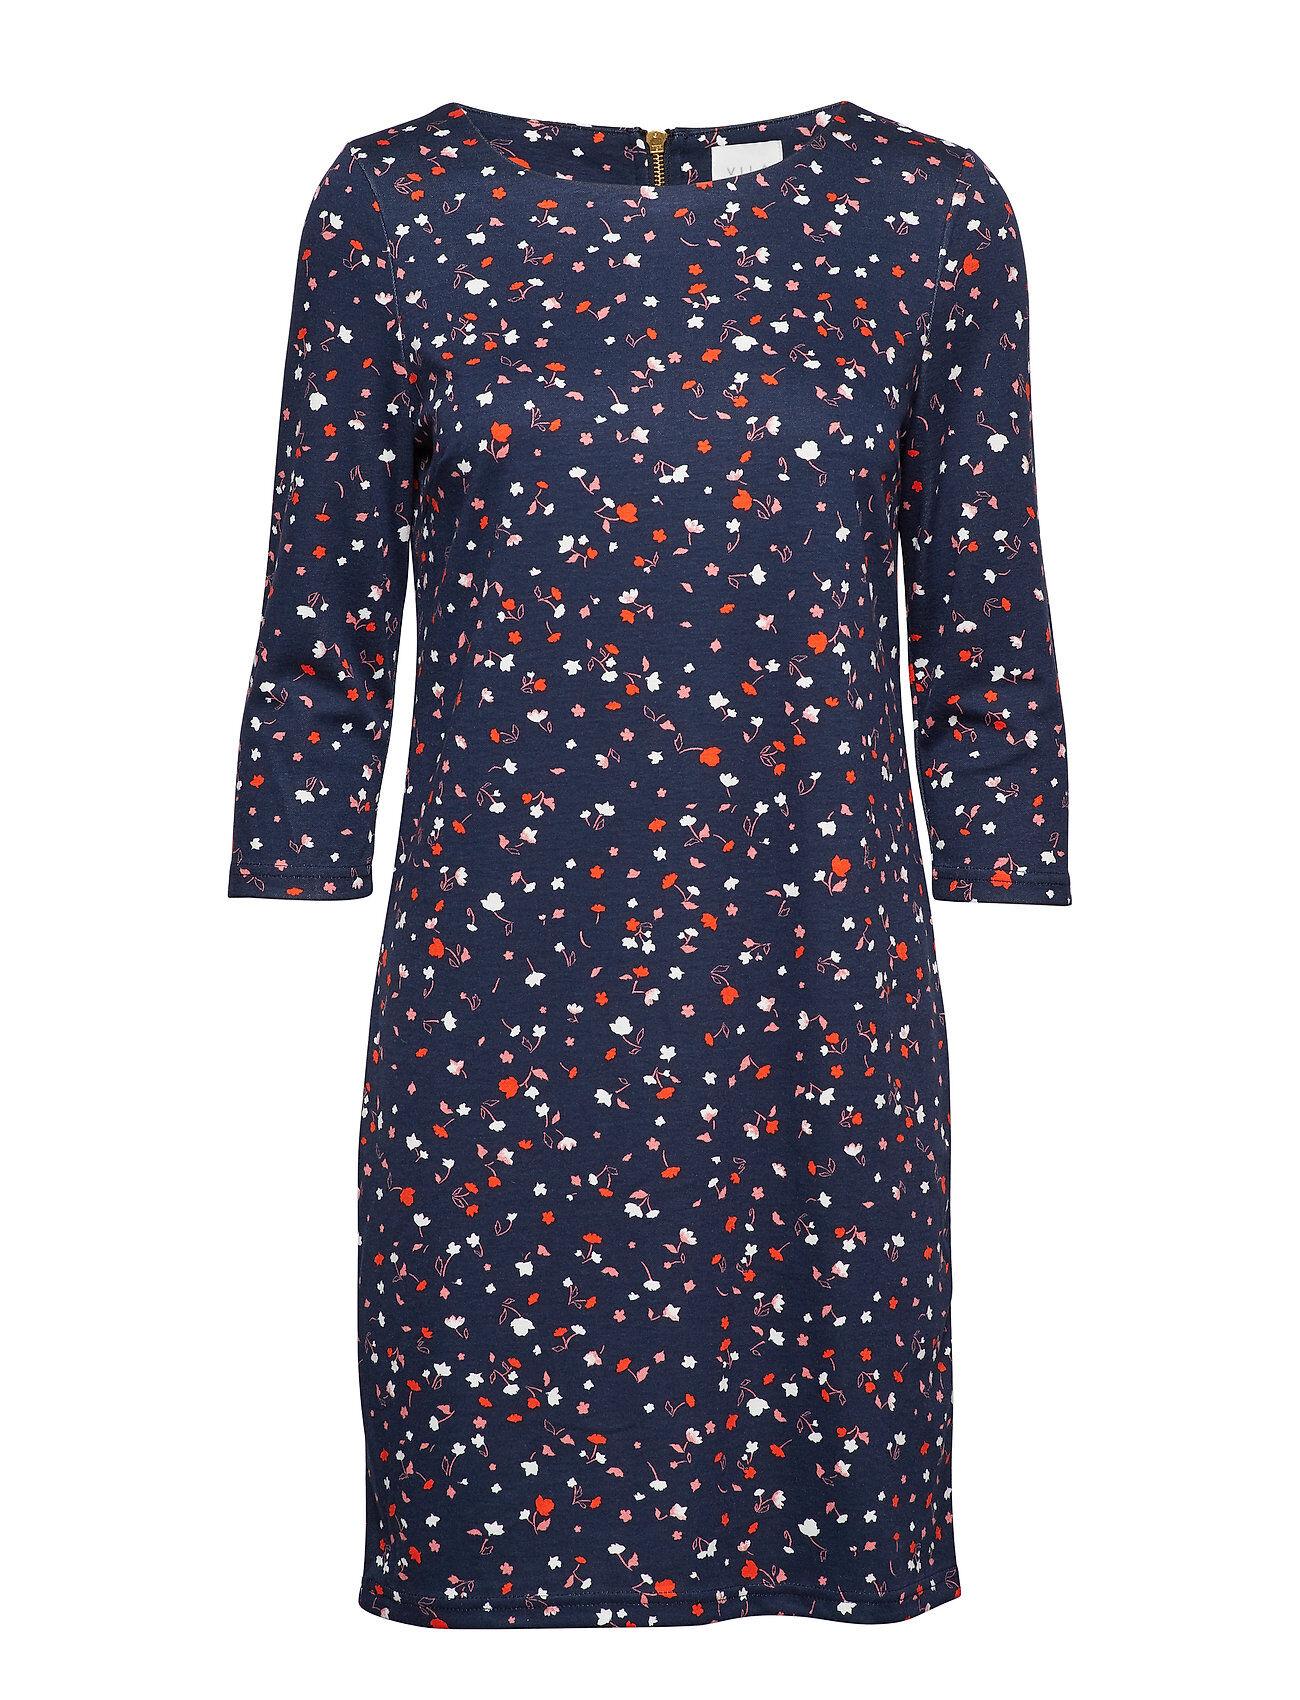 Image of VILA Vitinny New Dress - Lux Lyhyt Mekko Sininen VILA